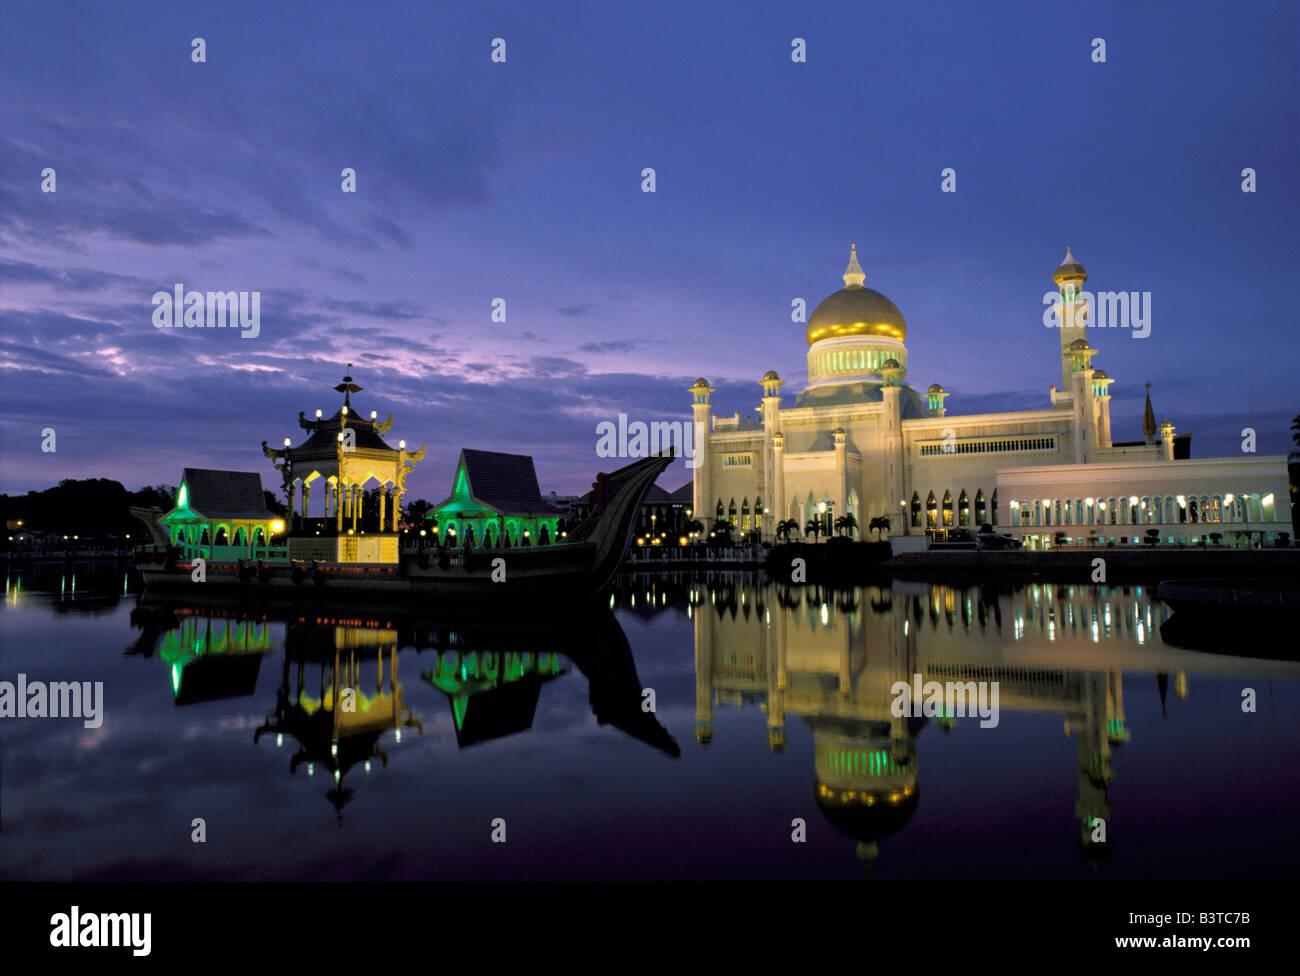 Asia, Brunei, Bandar Seri Begawan. Sultan Omar Ali Saifuddin Mosque. - Stock Image